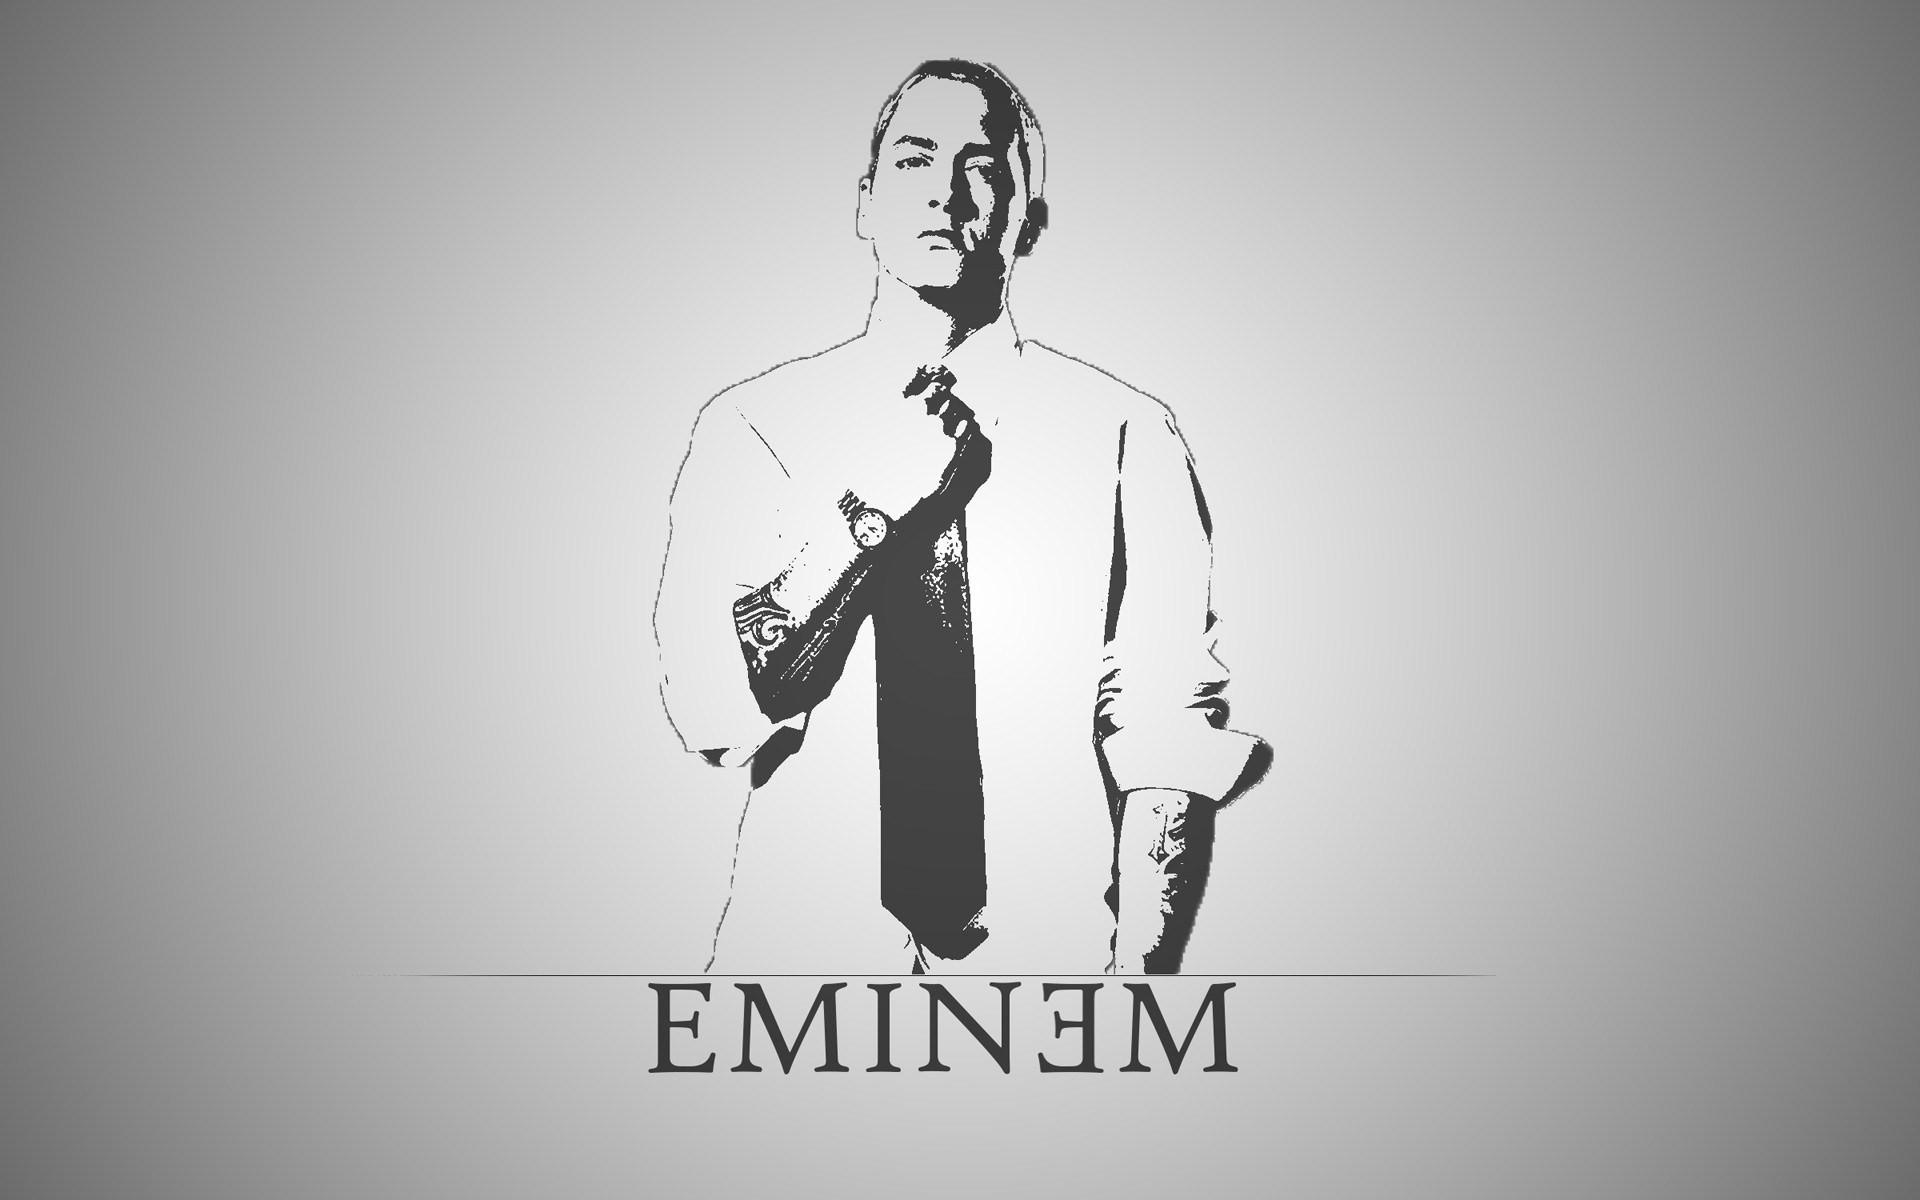 Eminem Wallpapers HD white sketch